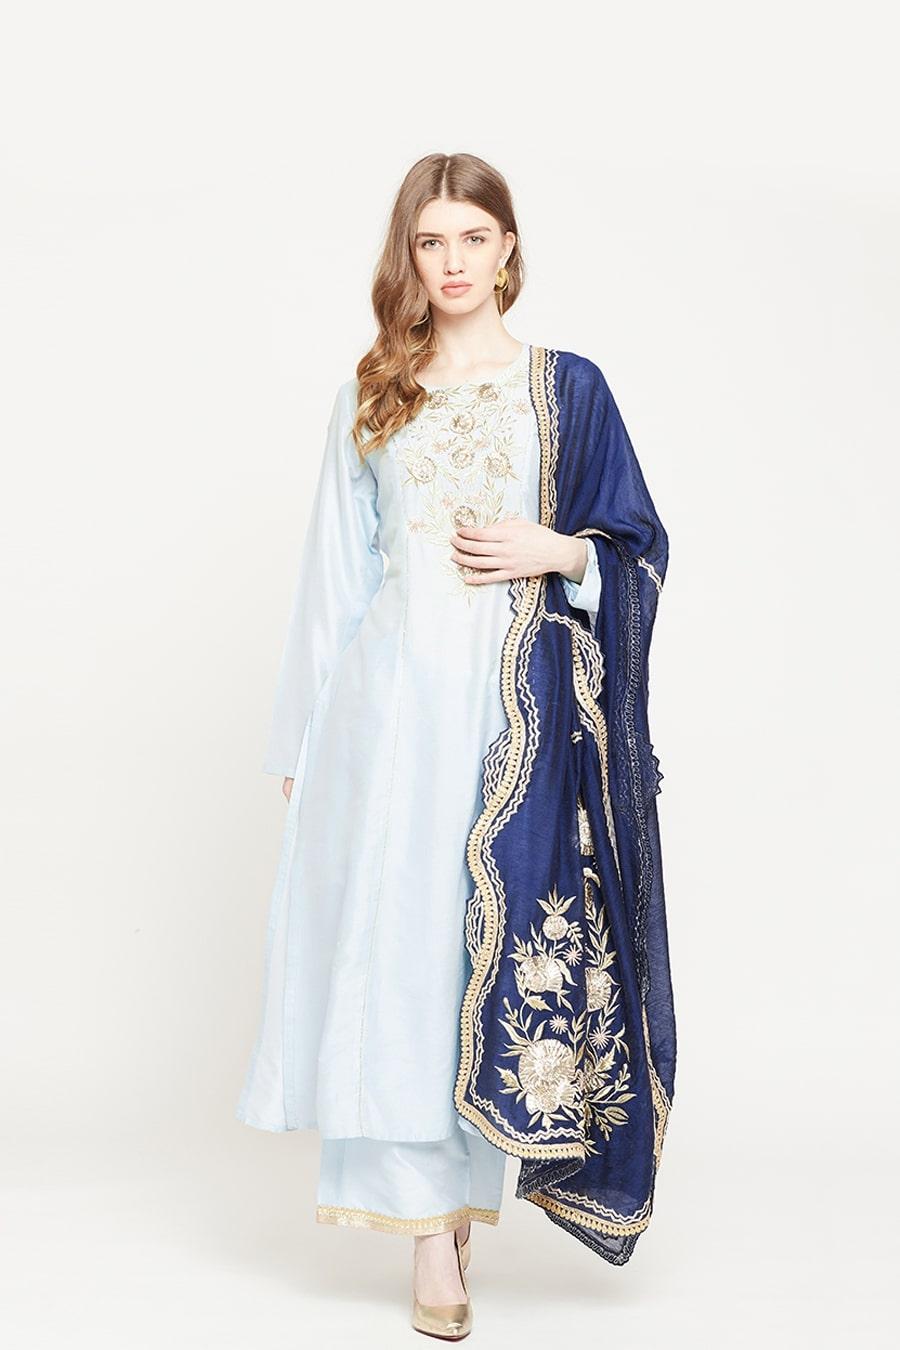 Angelic Powder Blue Suit